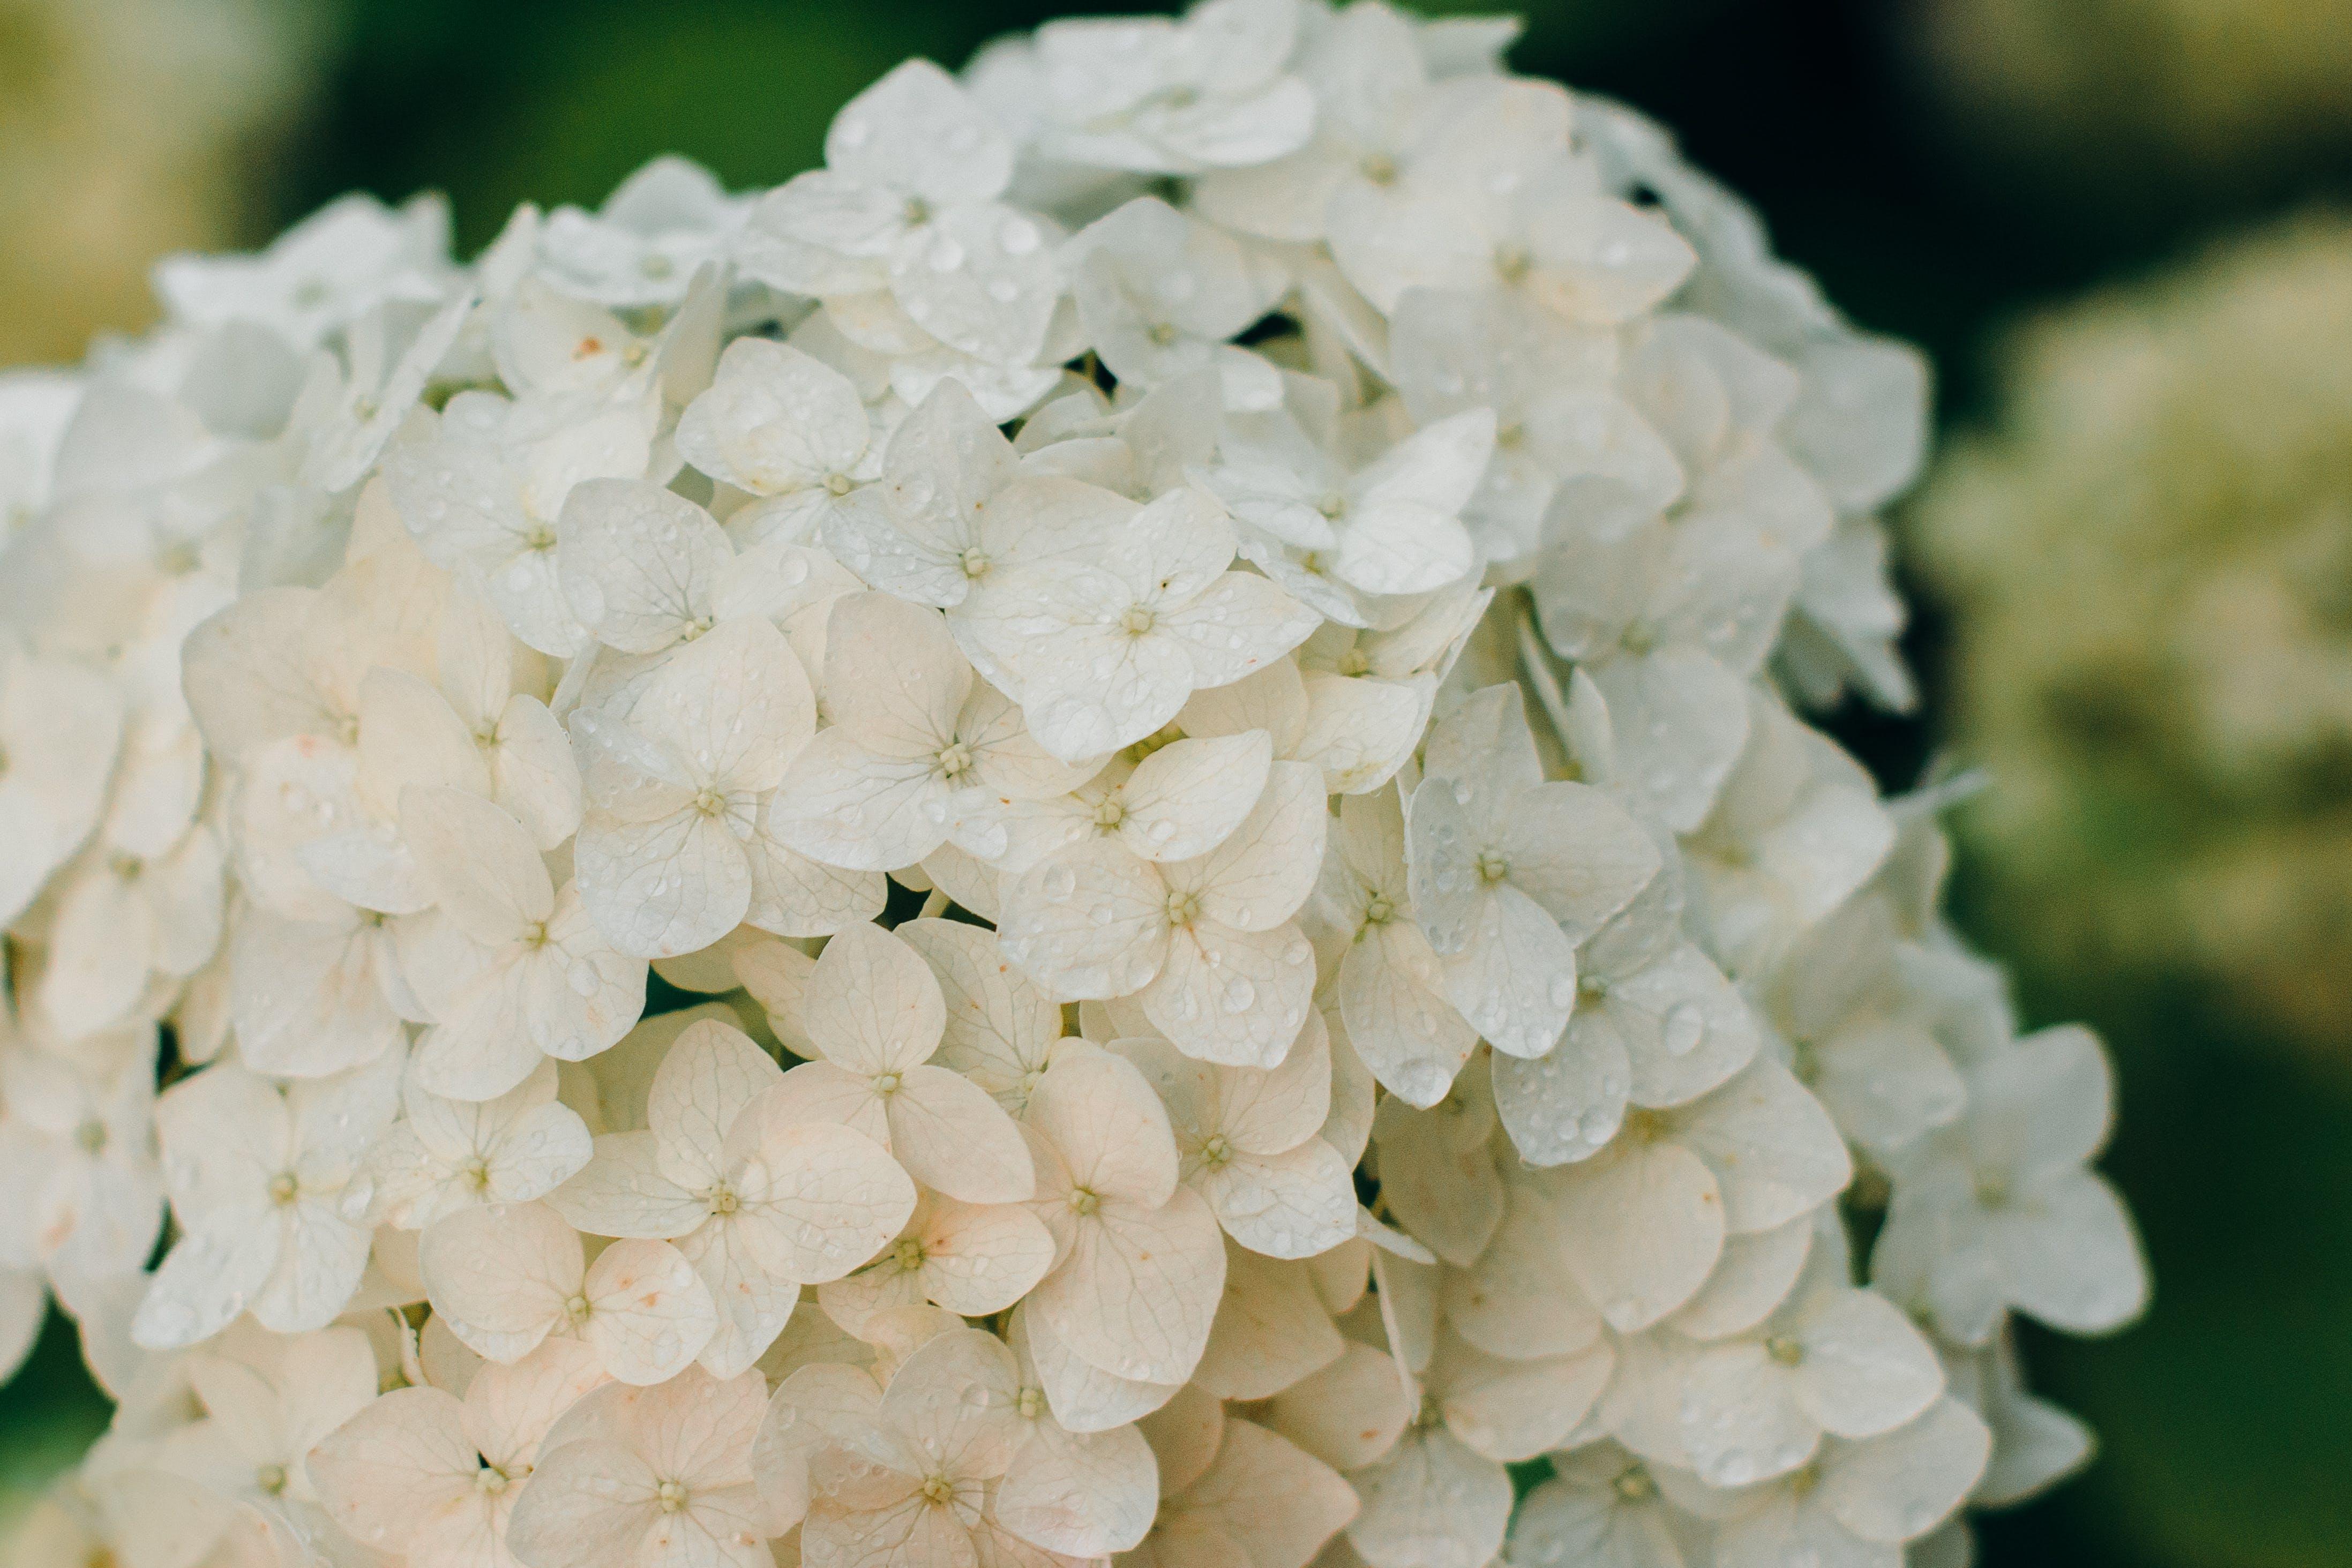 Selective Focus Photograph of White Hydrangea Flower